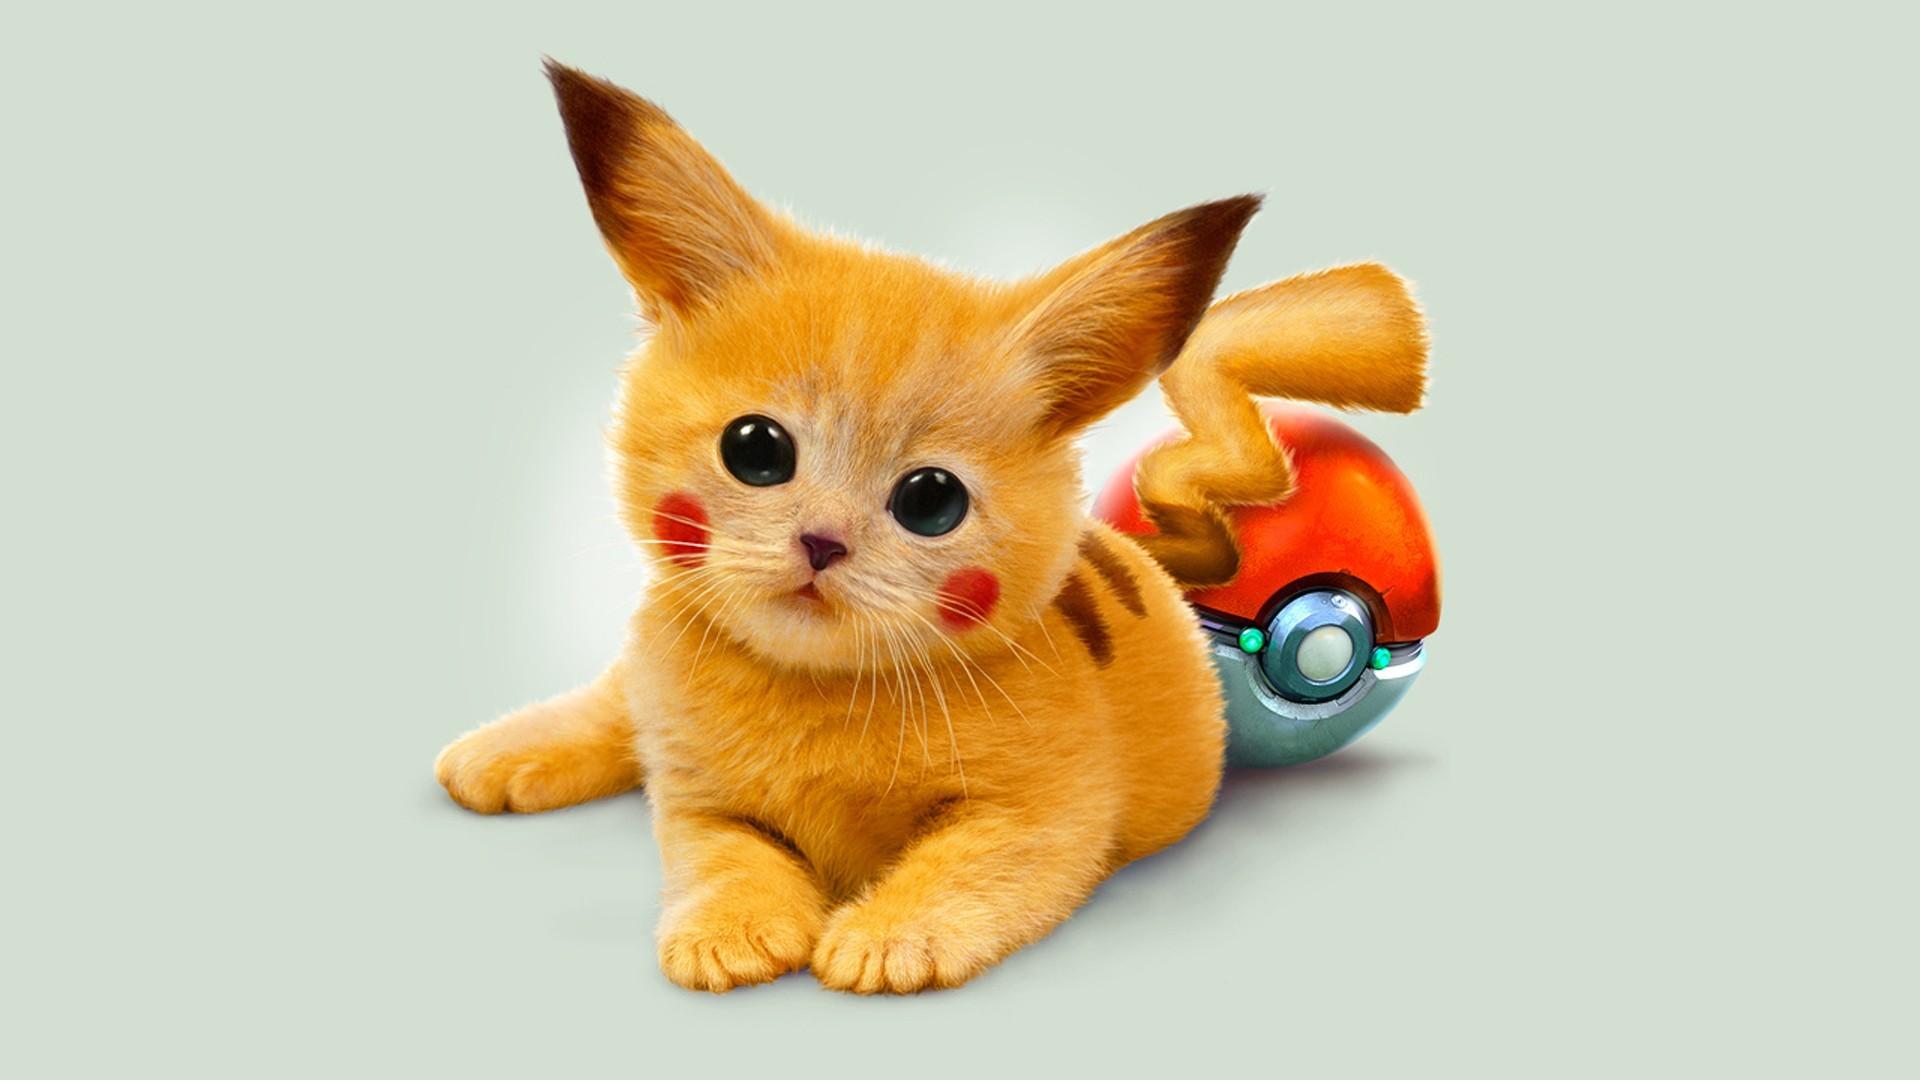 wallpaper pokemon · cats · Pikachu · Google · Pokeball